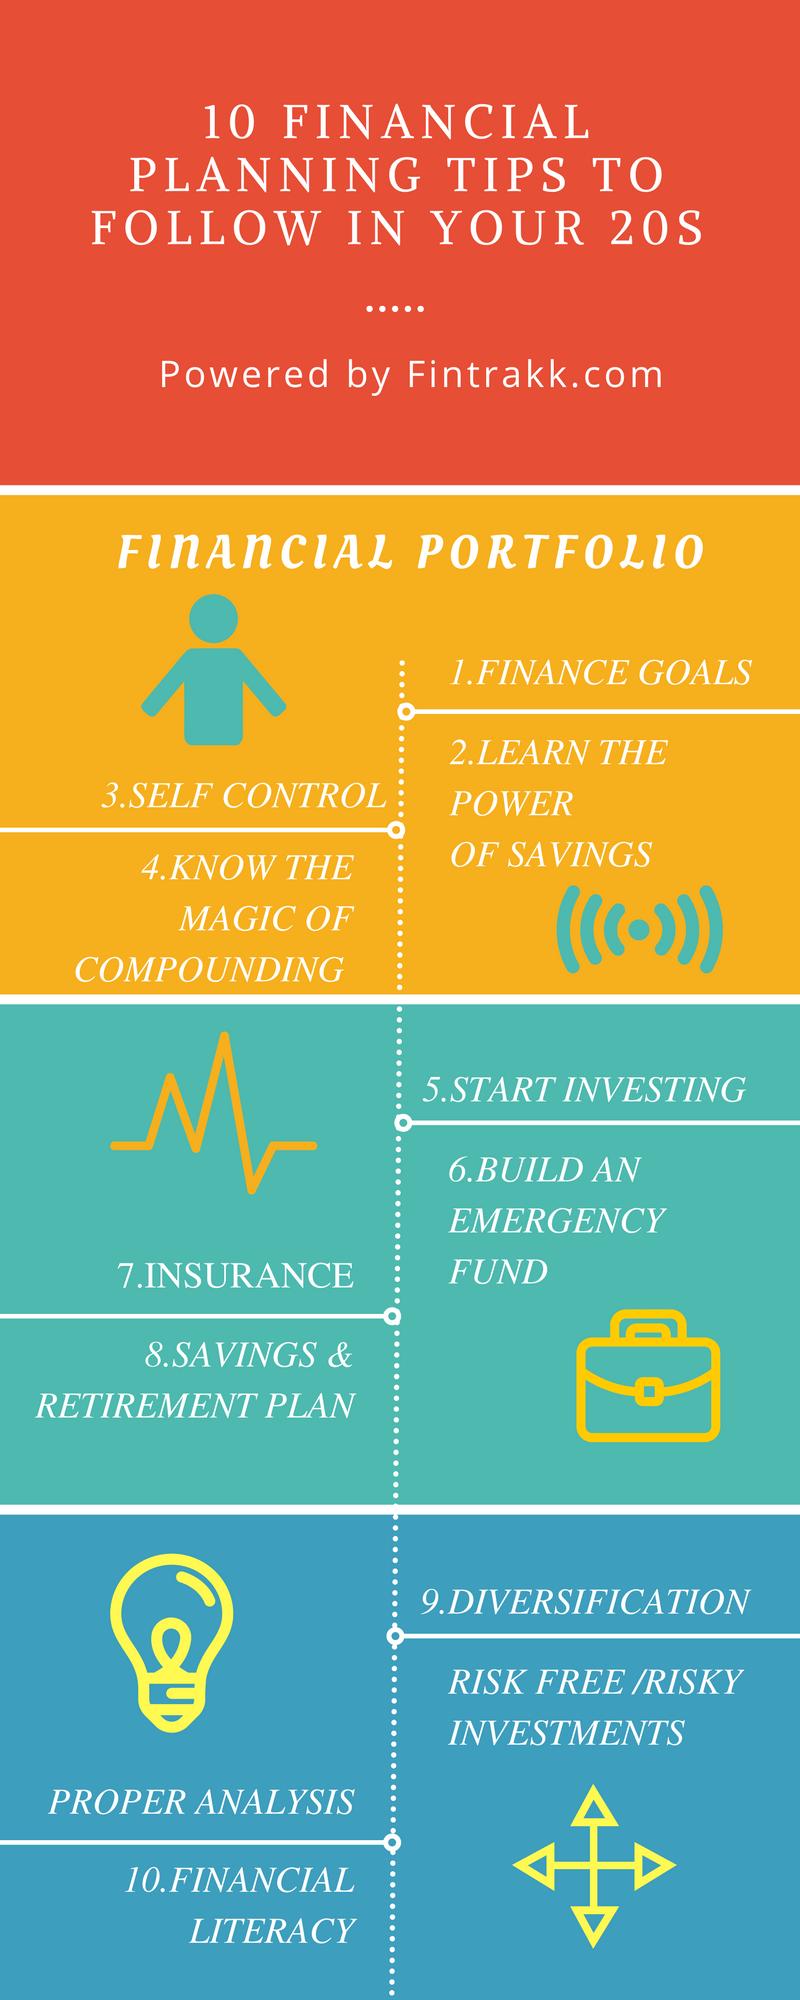 10 Financial Planning Tips To Follow In Your 20s Fintrakk